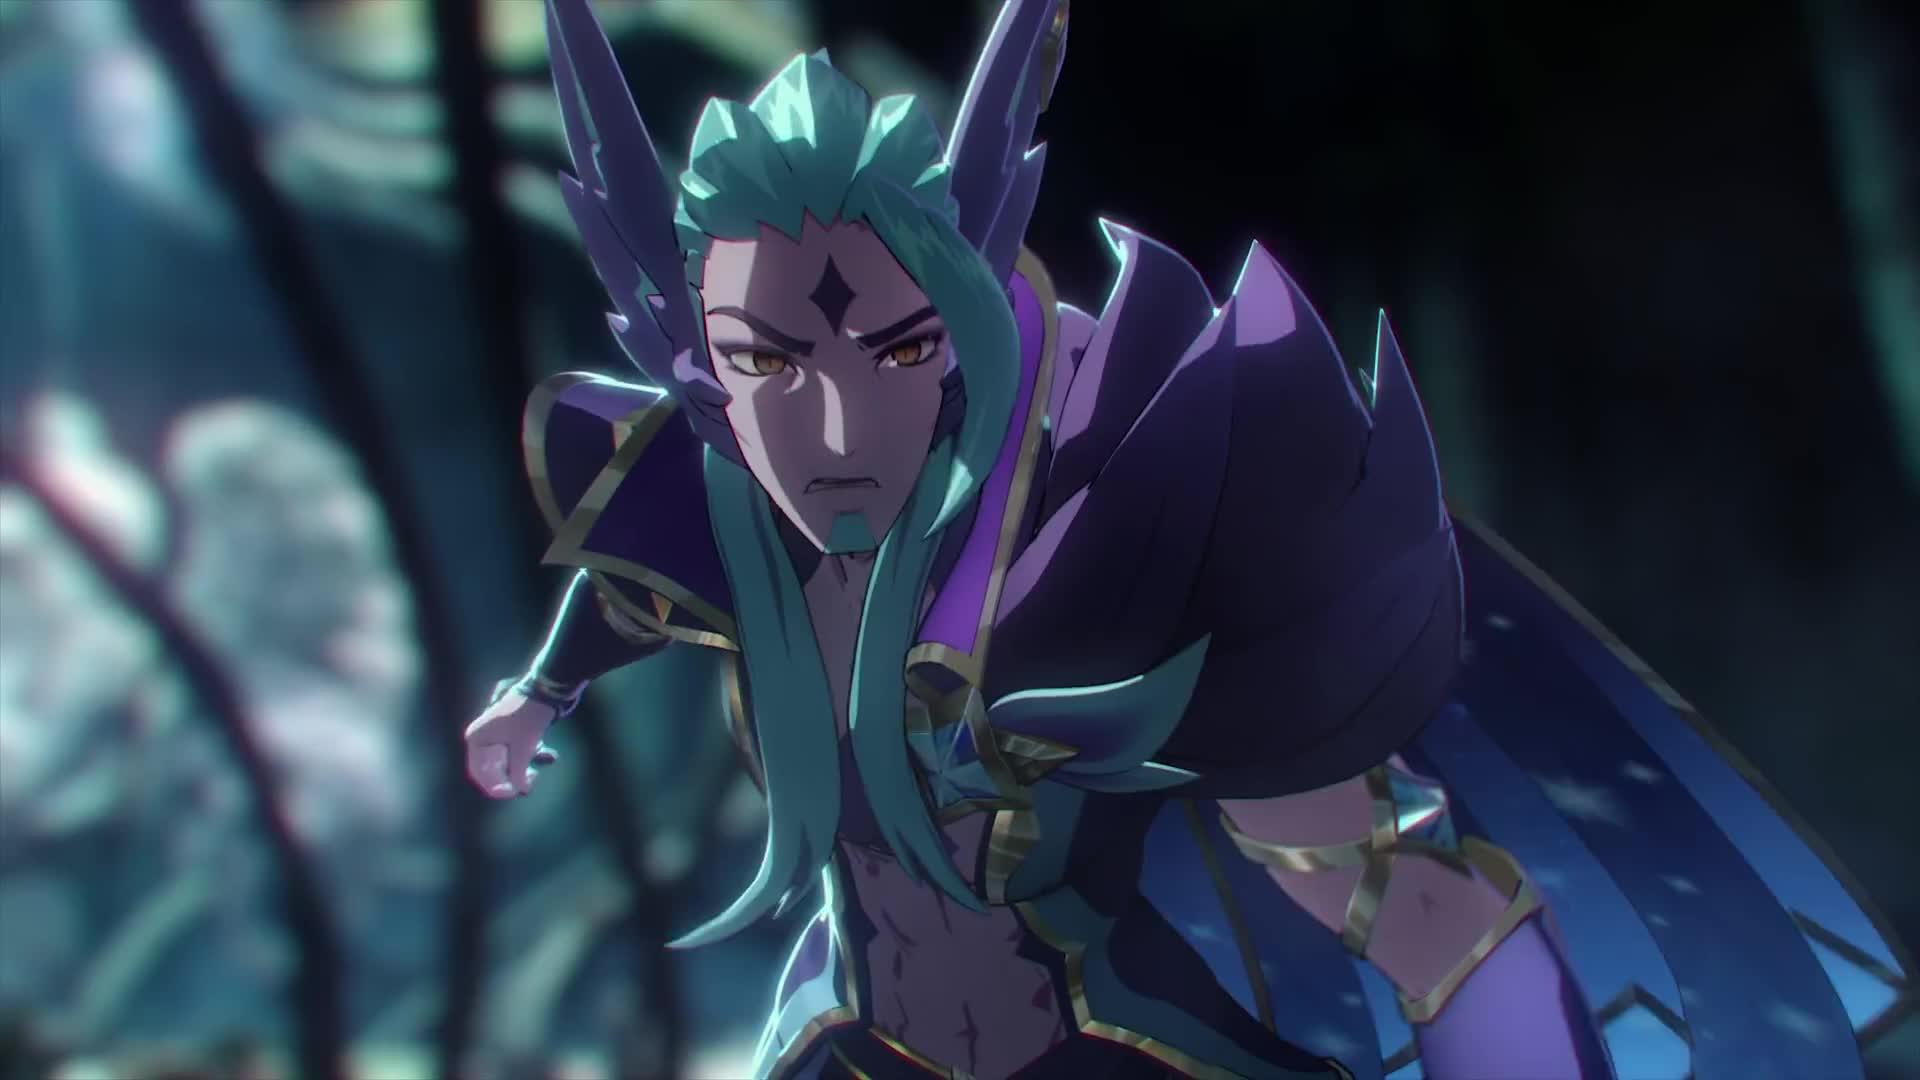 League of Legends - Star Guardian Animated Trailer [HD] screen capture